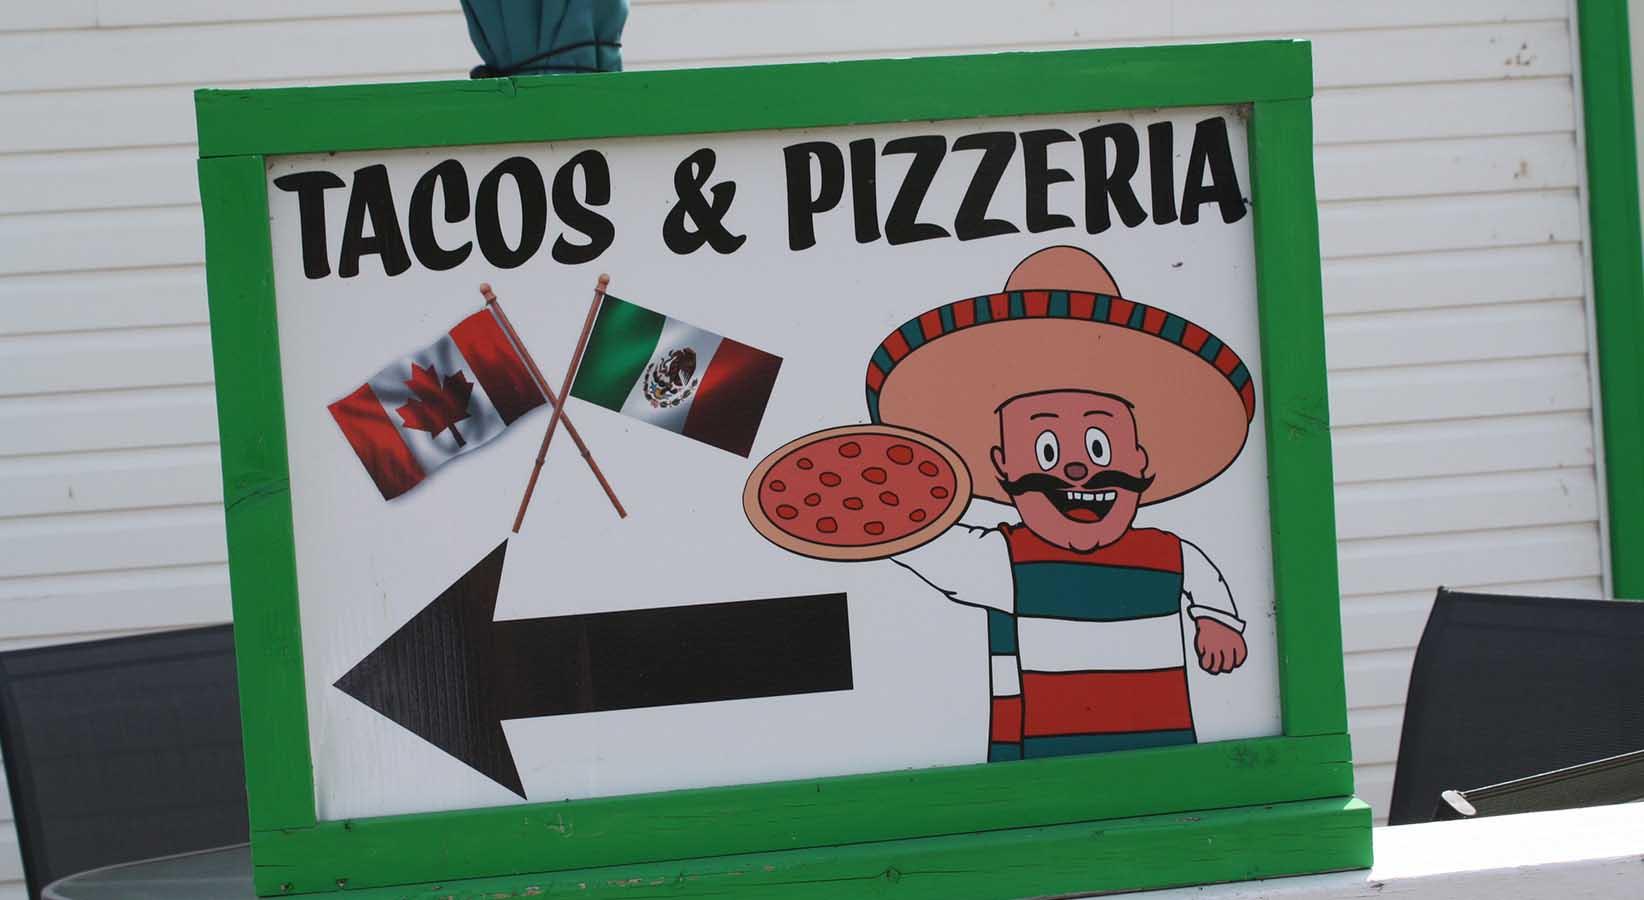 Senor Duggies Tacos & Pizzeria sign